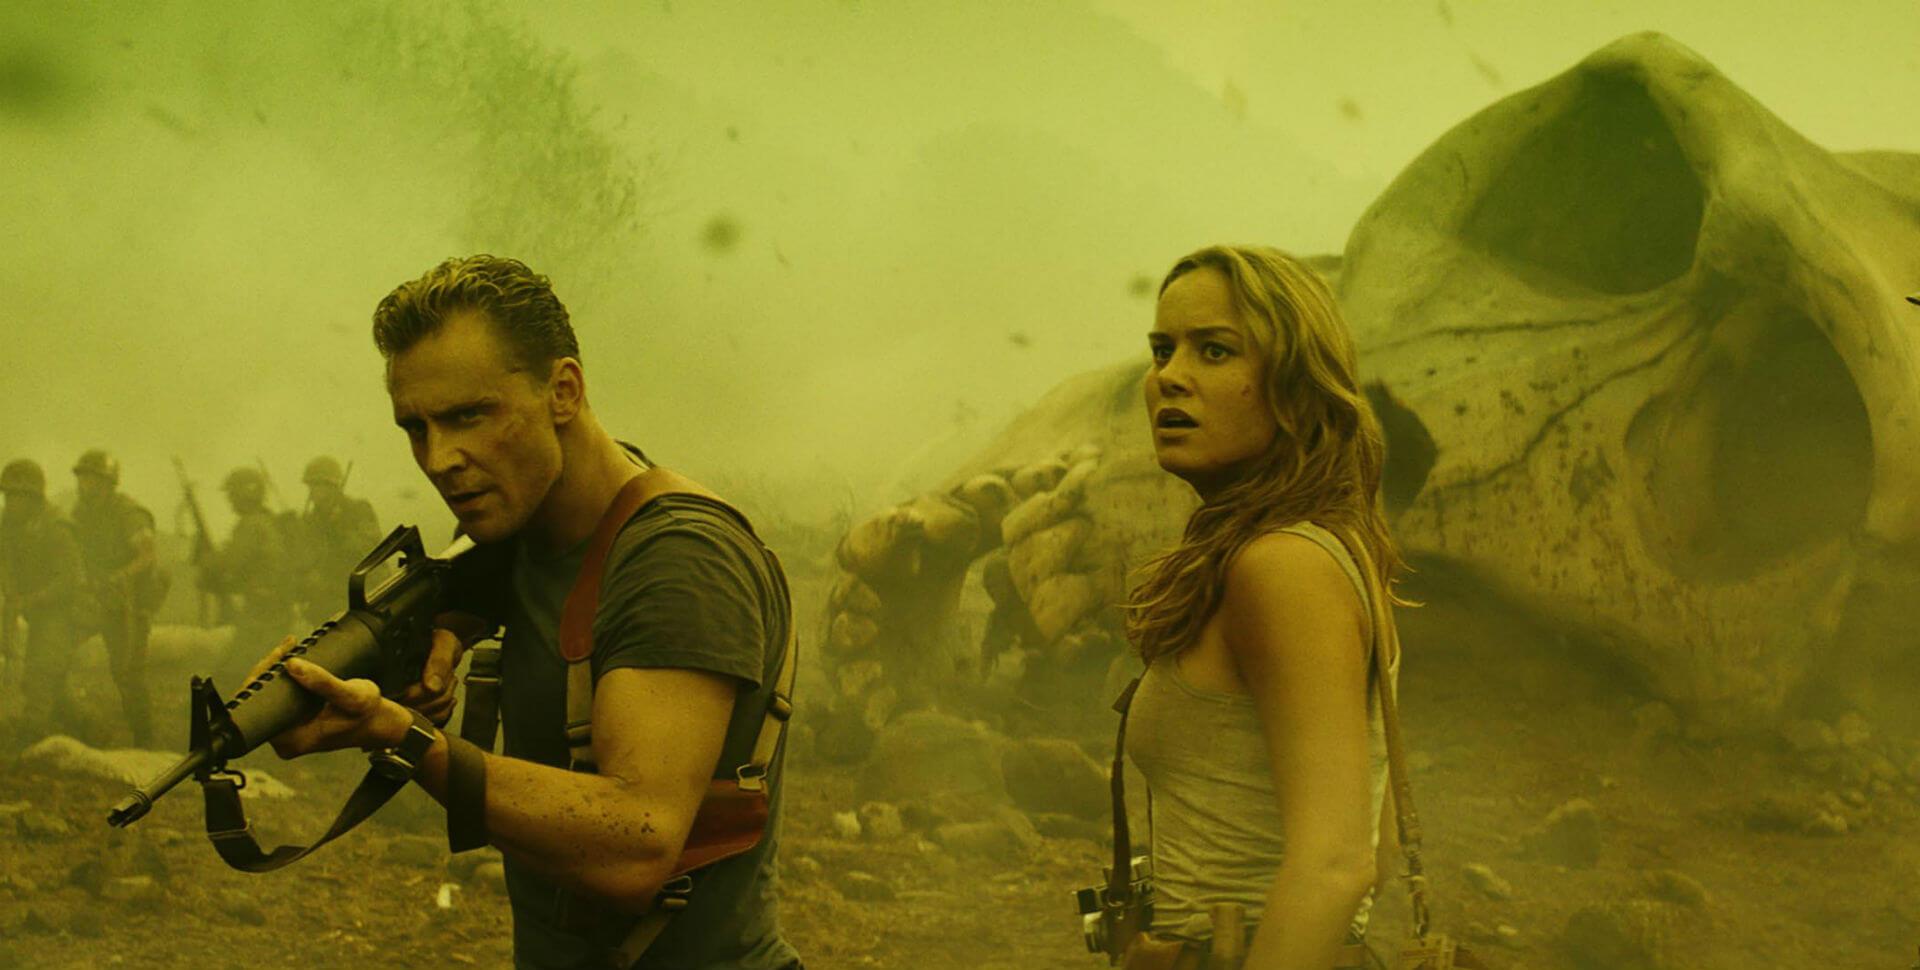 Kong: Skull Island 2017 Spoiler Free Movie Review